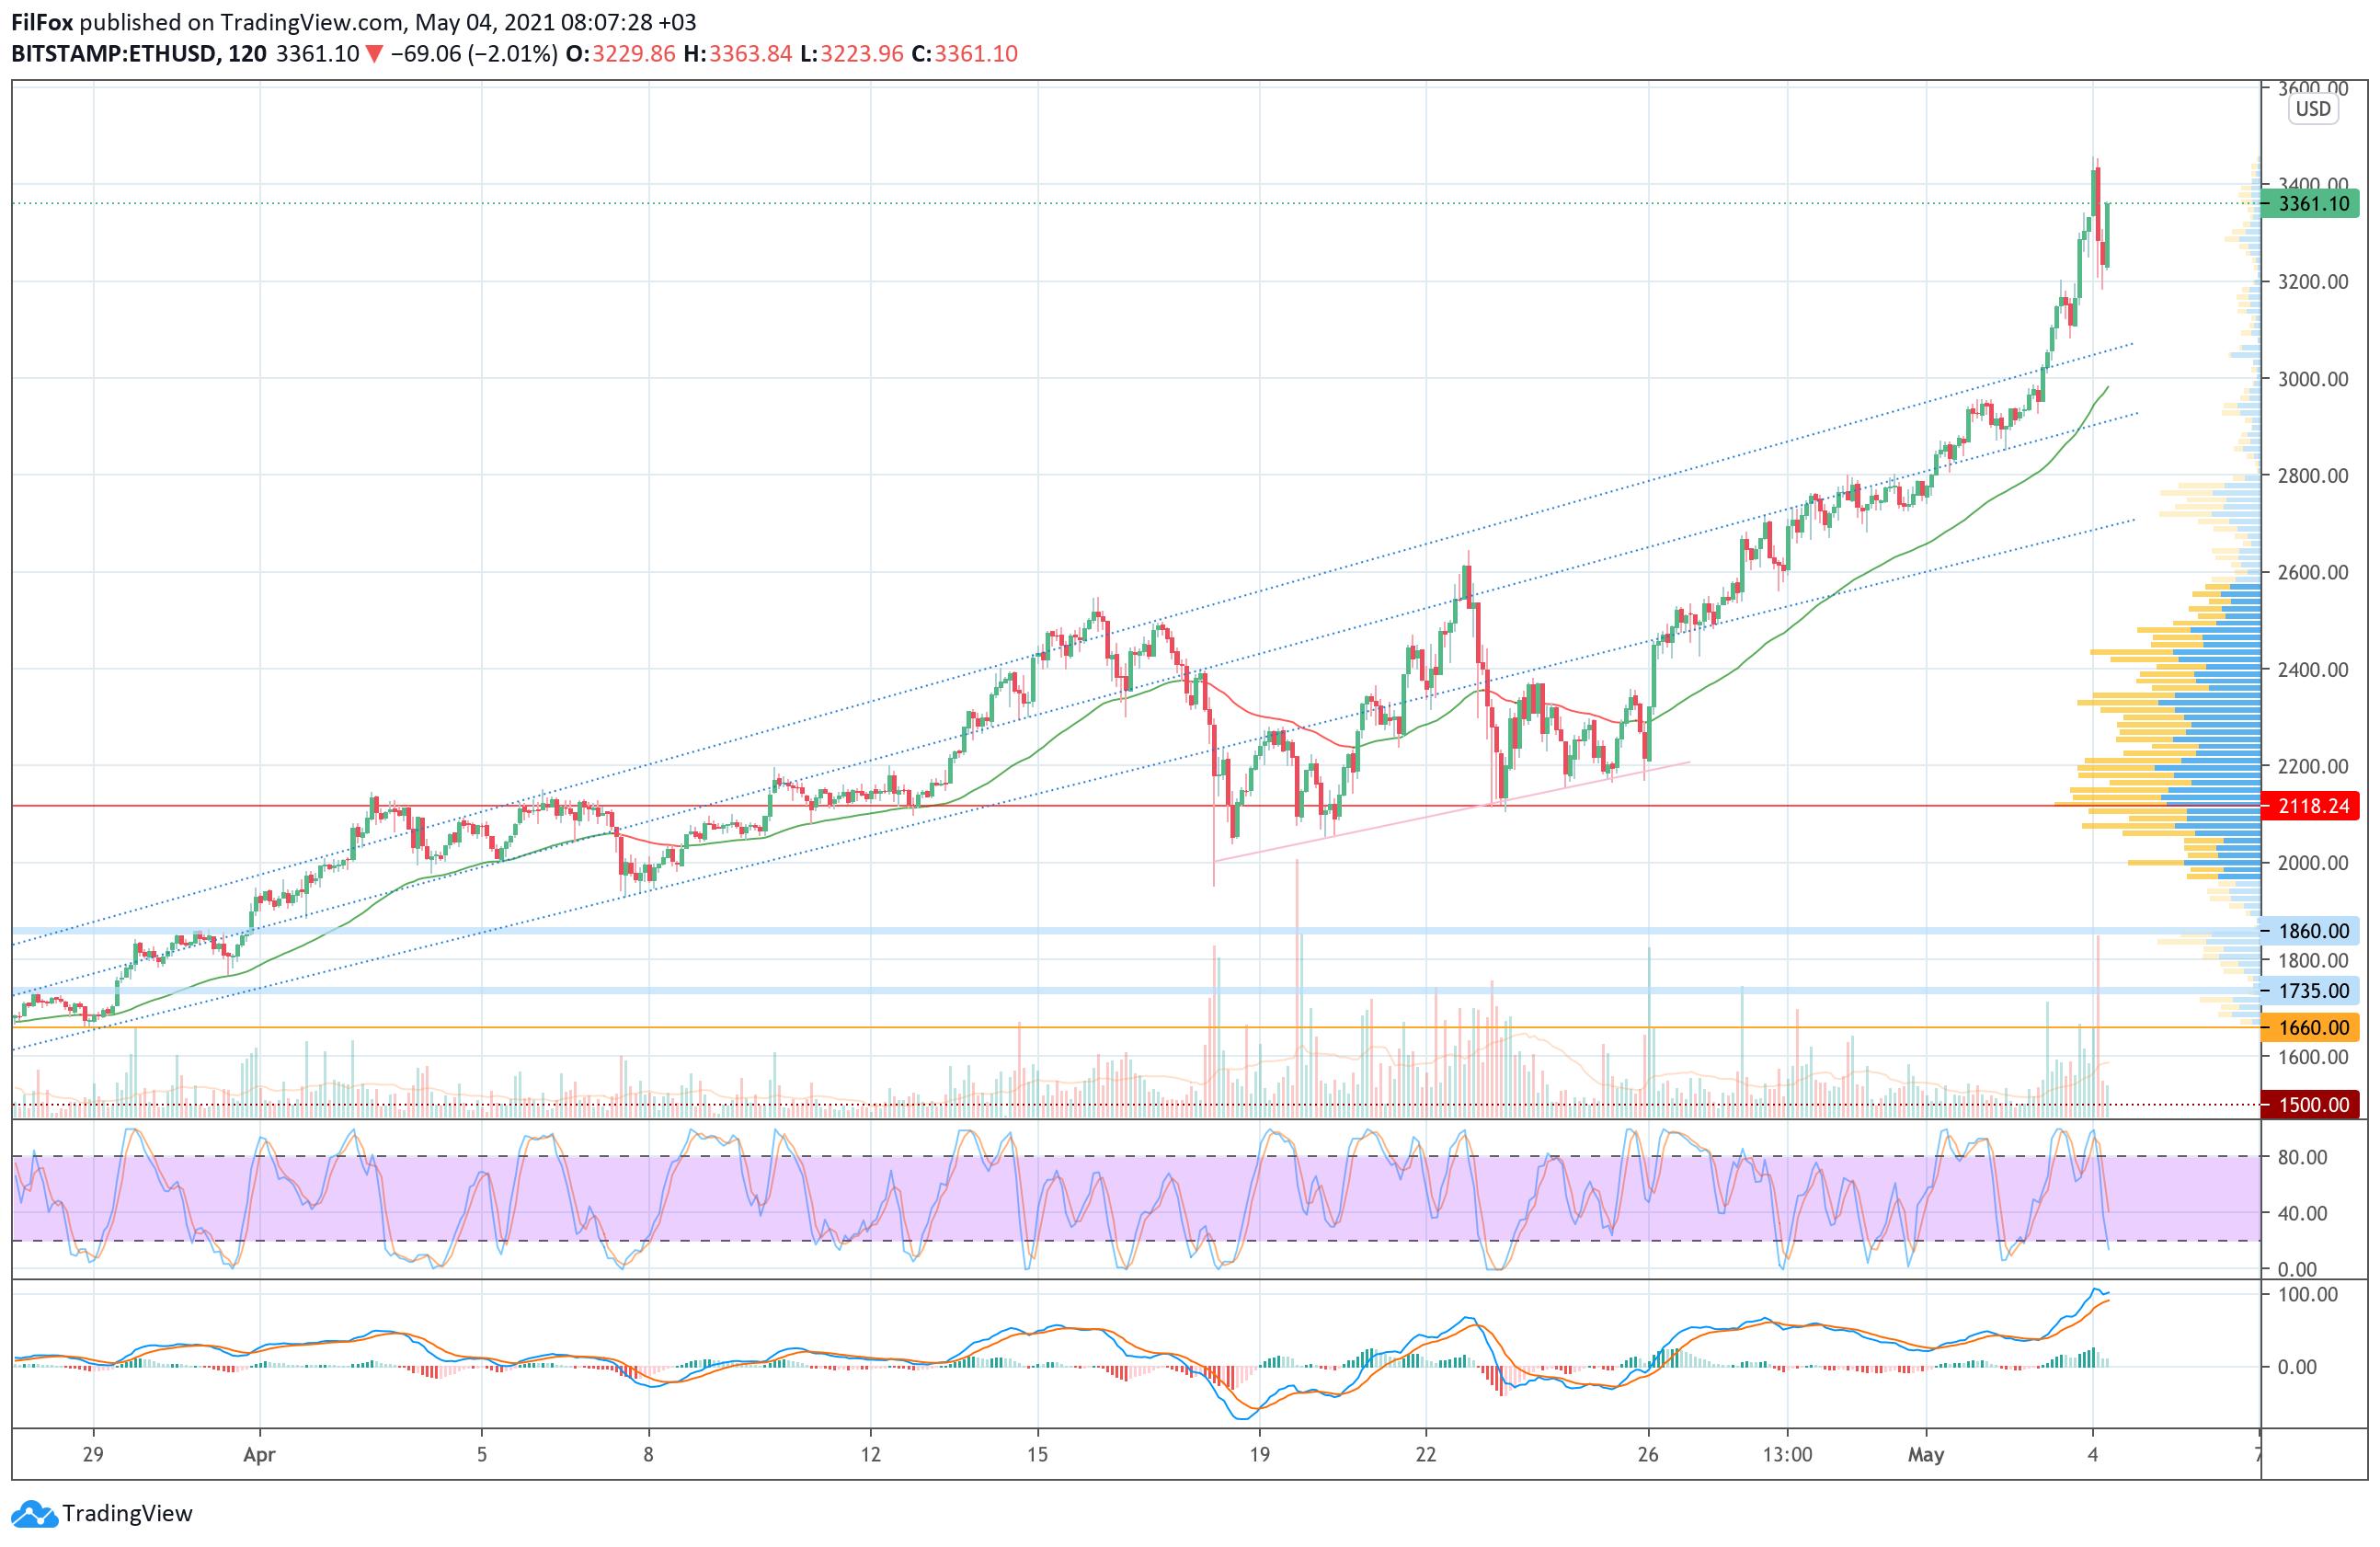 Анализ цен BTC, ETH, XRP (04.05.21)